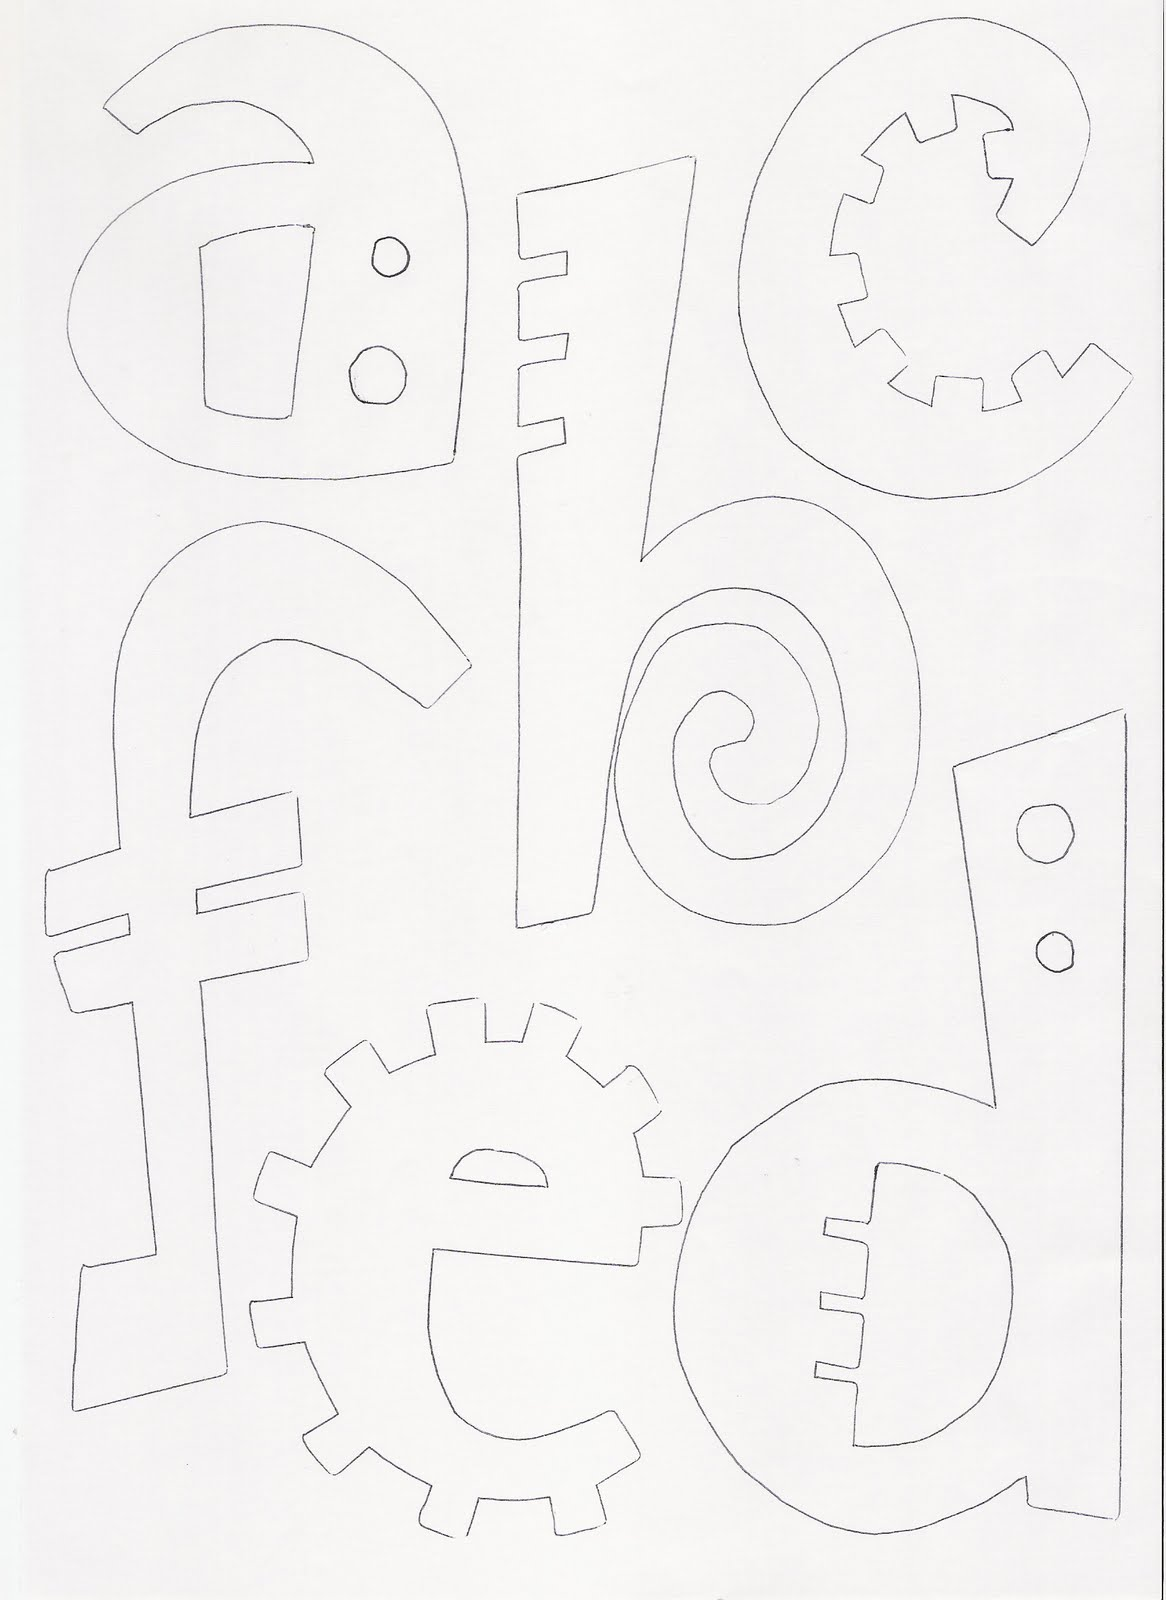 Maestroscomot letras raras for Moldes para pavimentos de hormigon